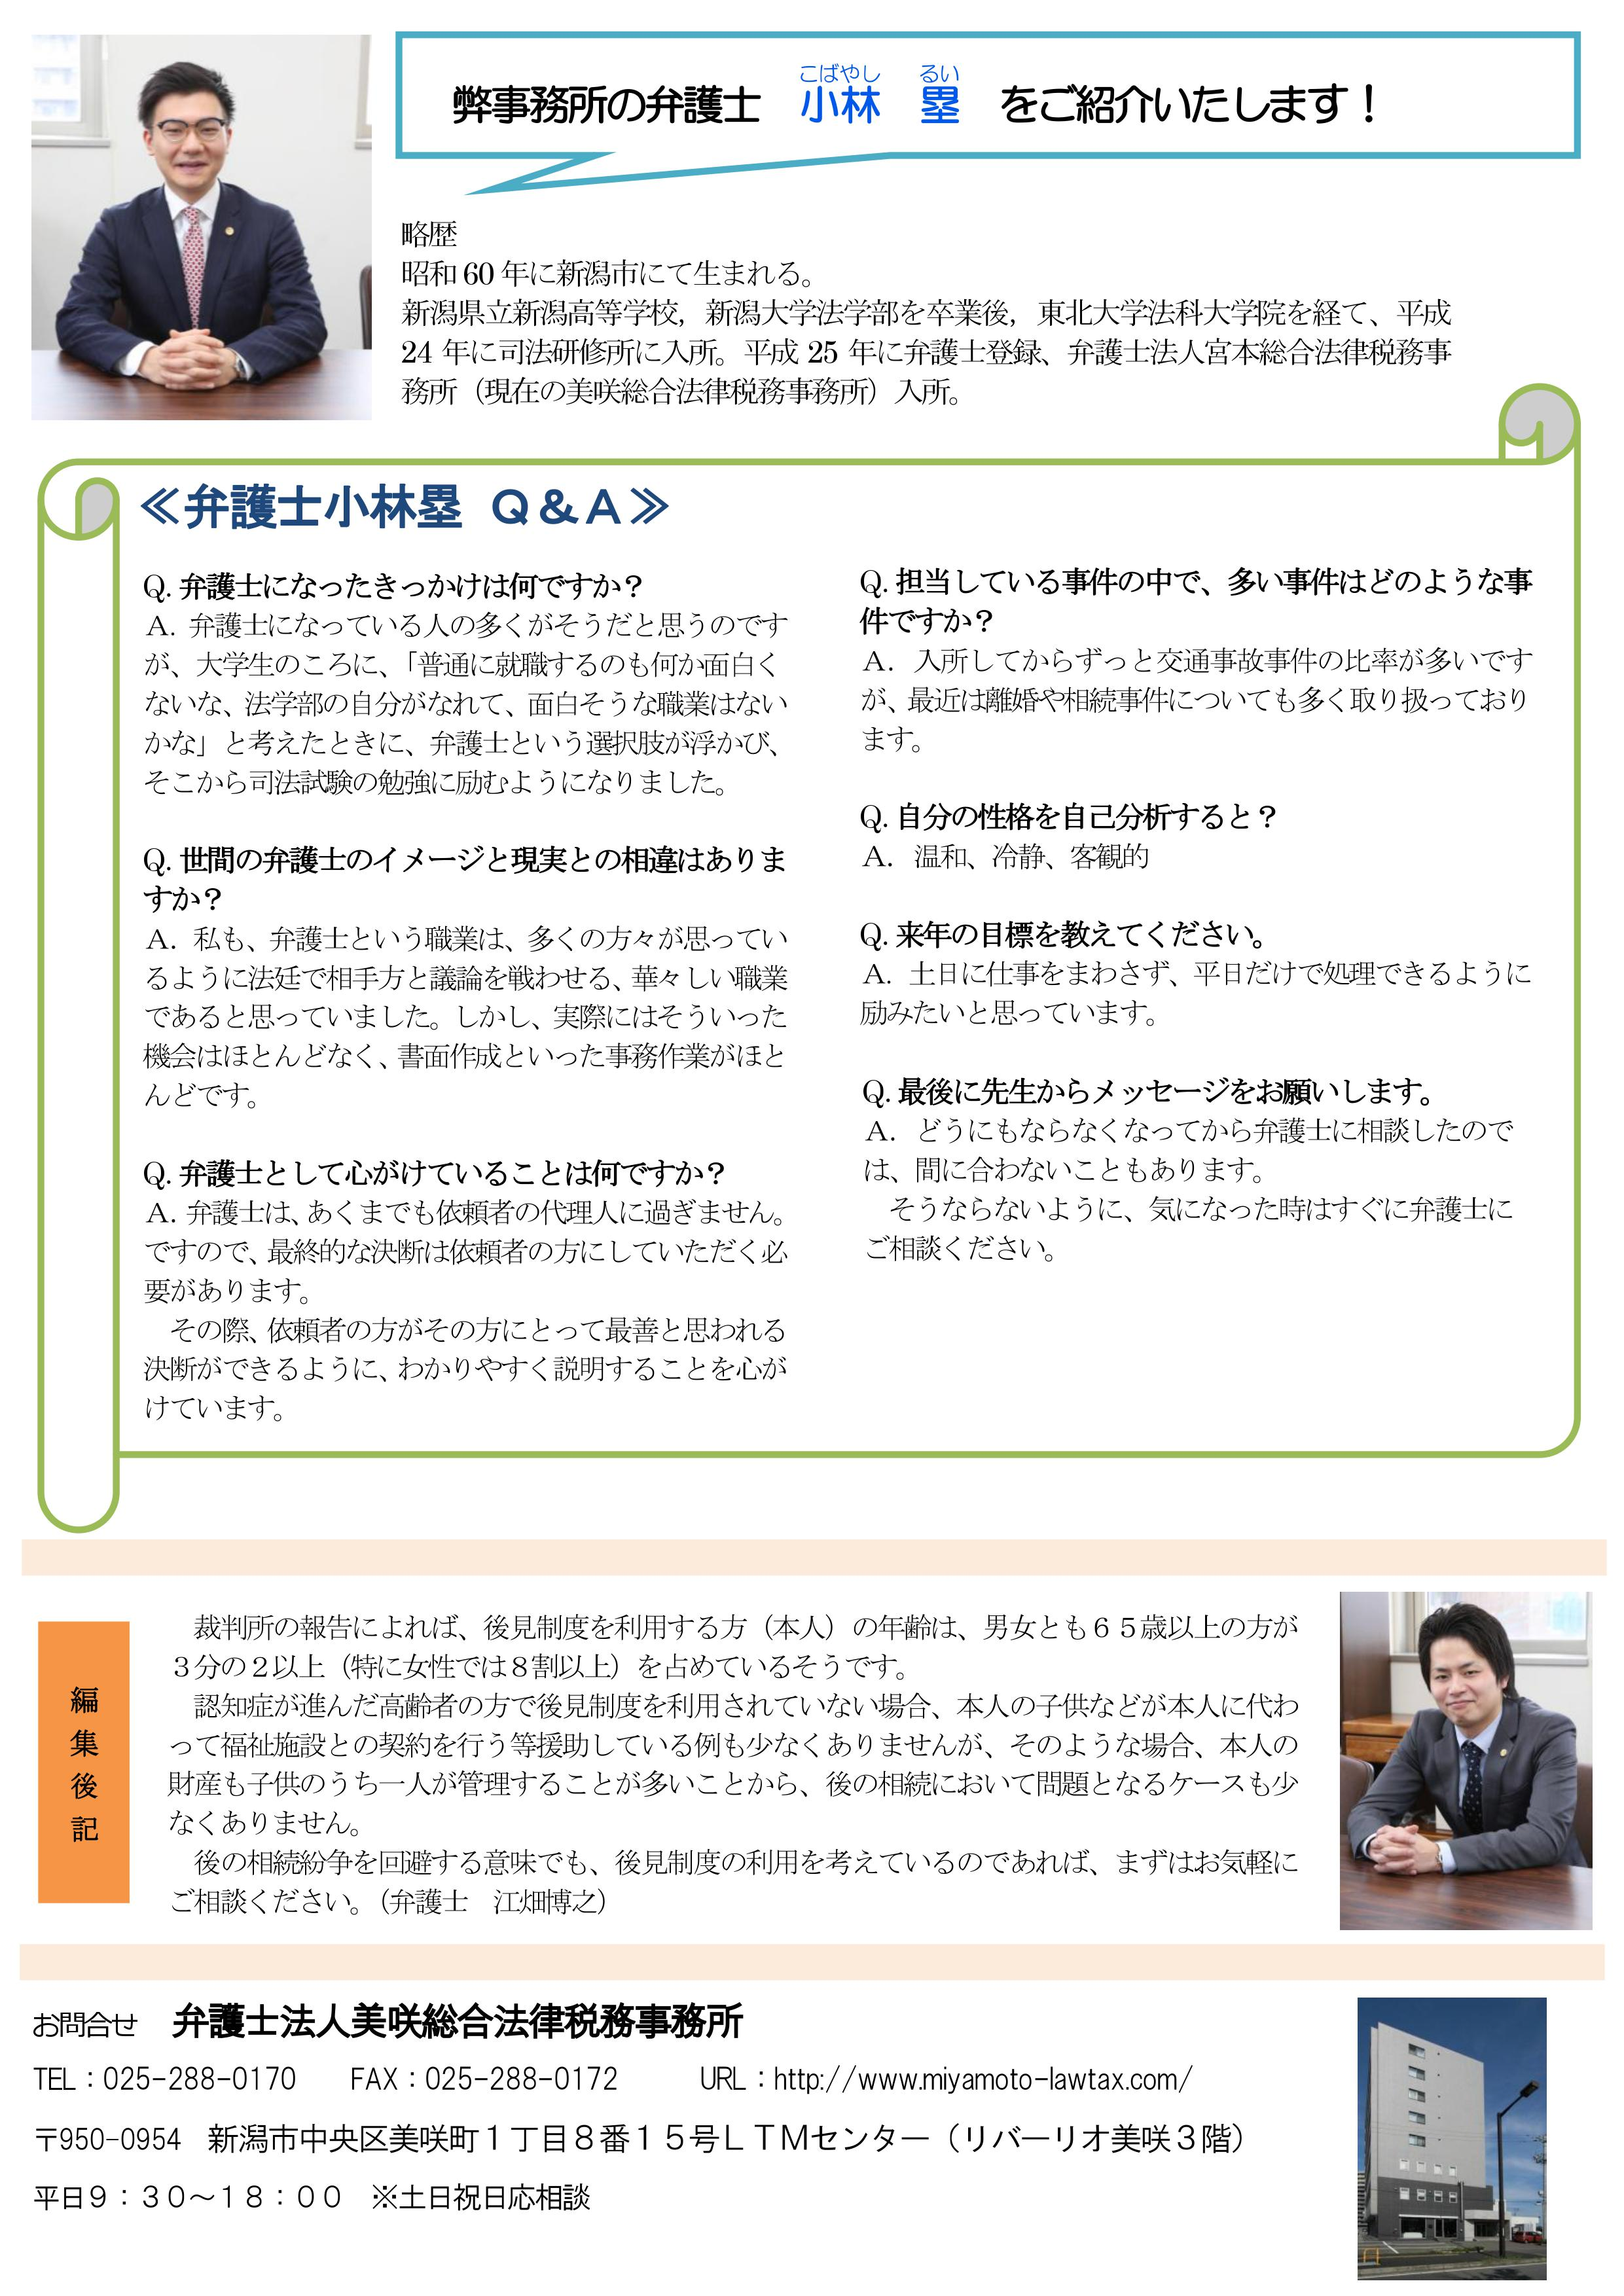 201612MISAKINewsletterVol.6-2.jpg